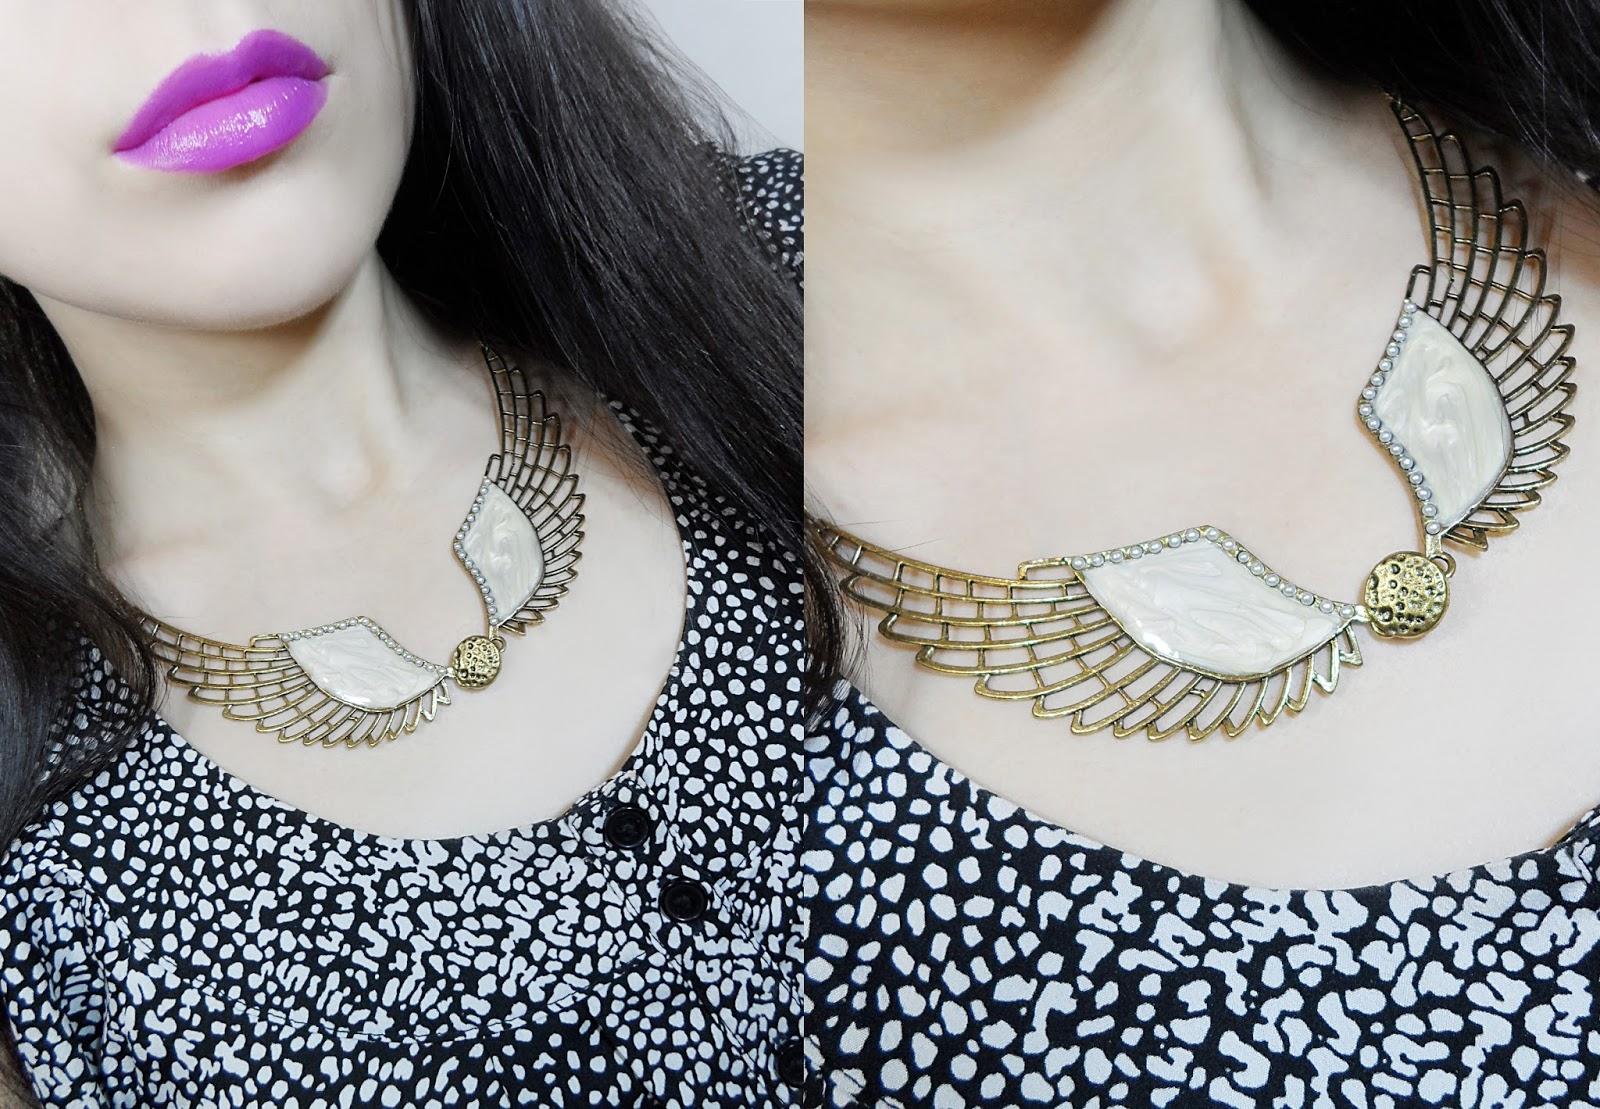 fblogger fashion vintage rosegal Steampunk Angel Wing Statement Necklace blogger review liz breygel